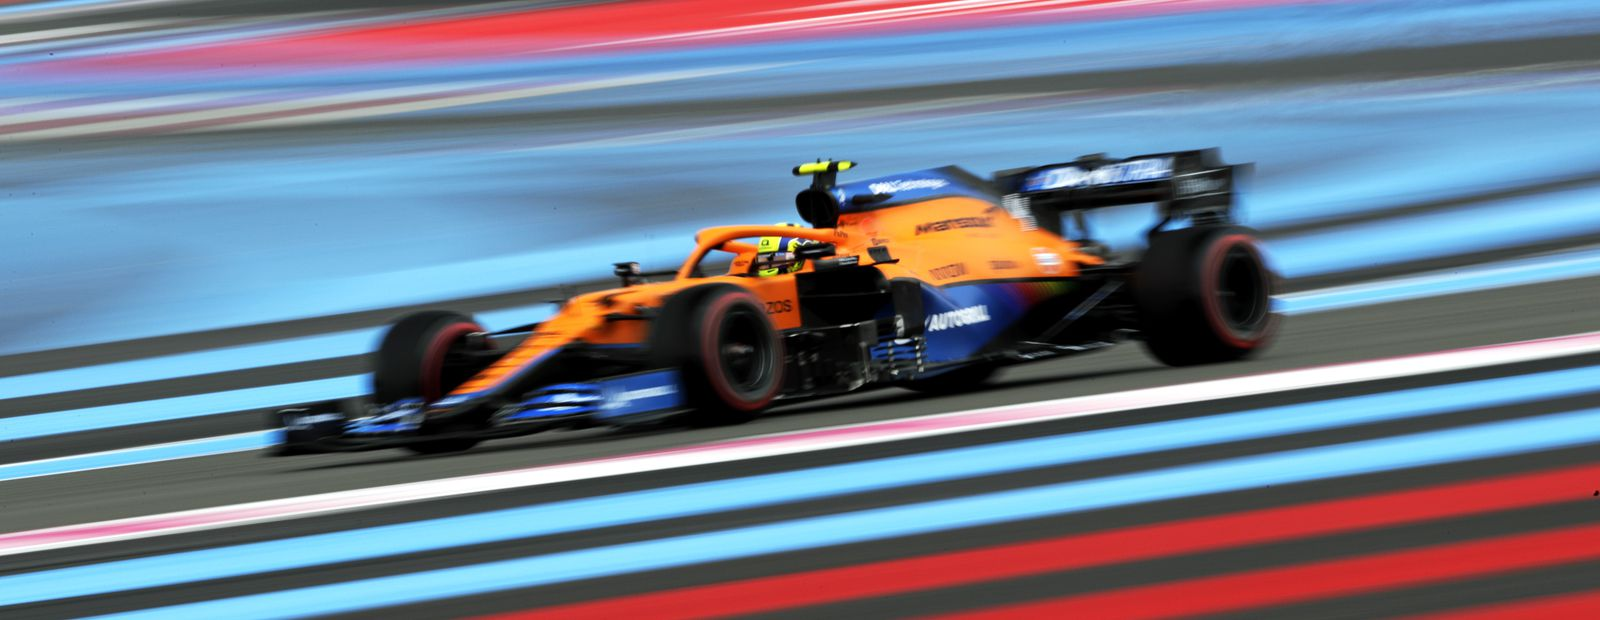 2021 French Grand Prix – Qualifying